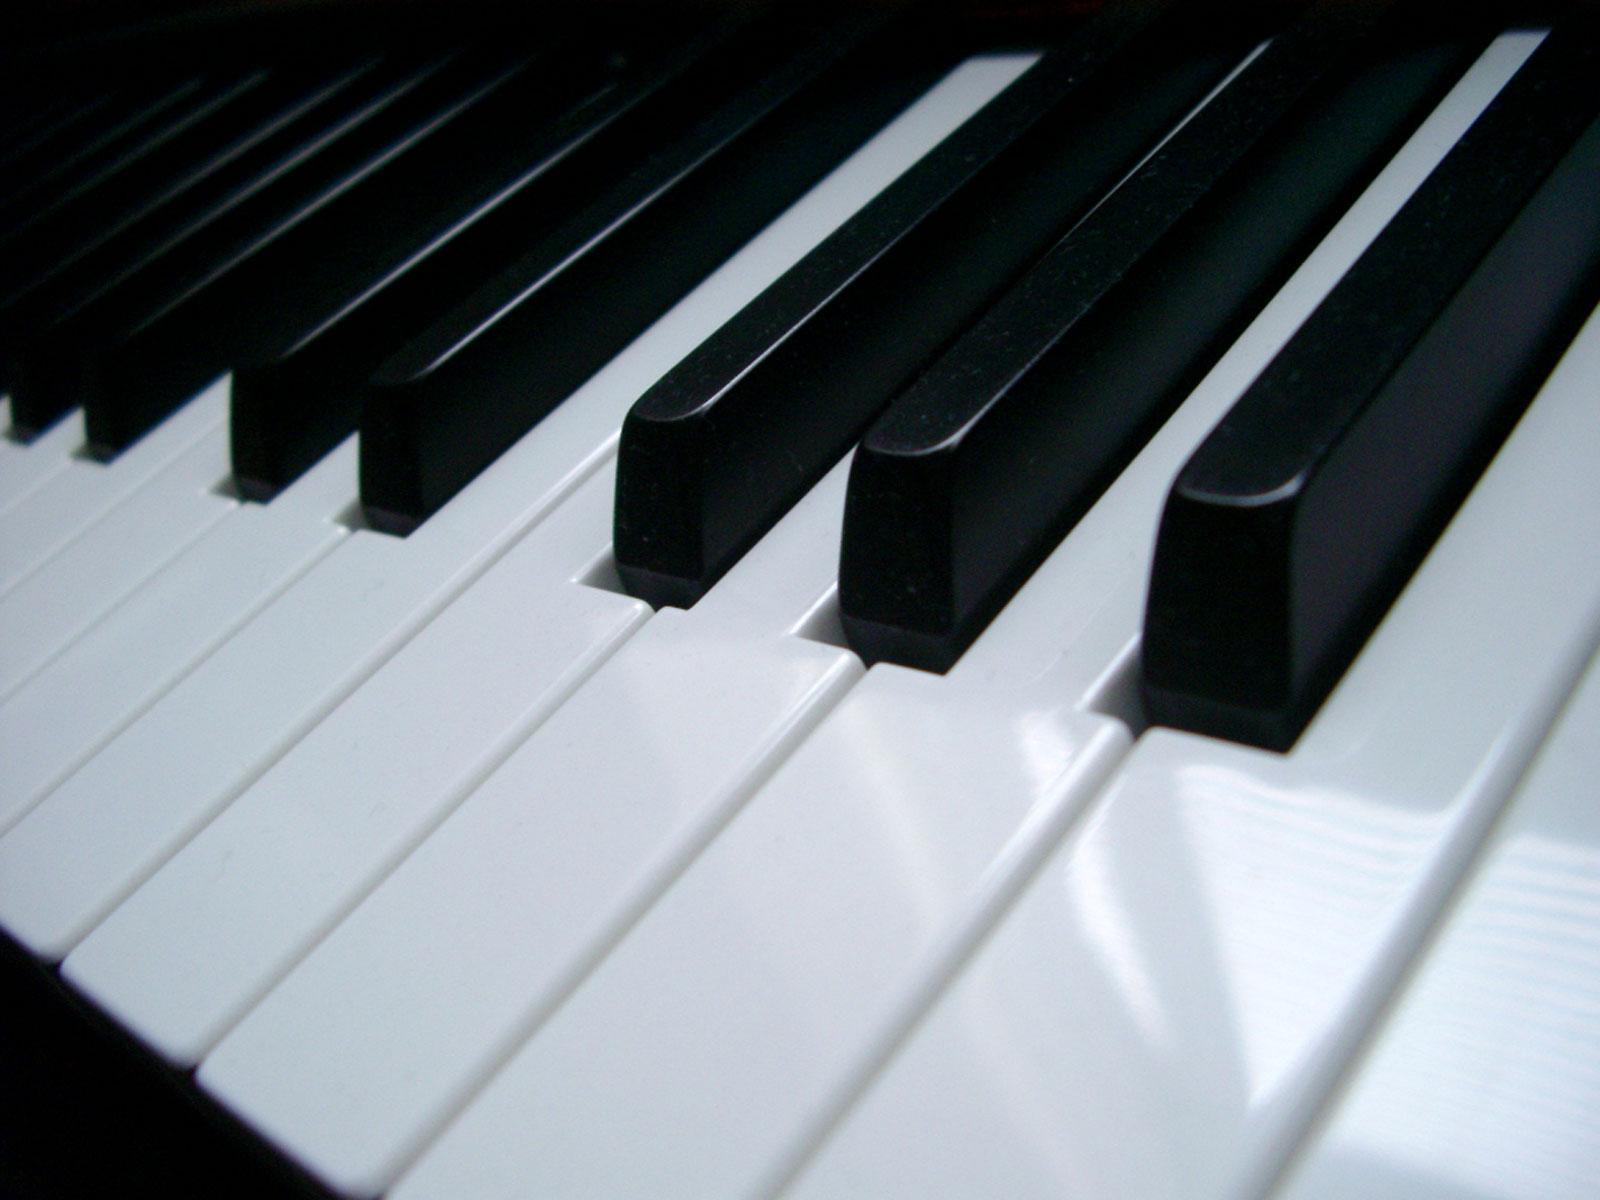 Erickson Piano Tuning